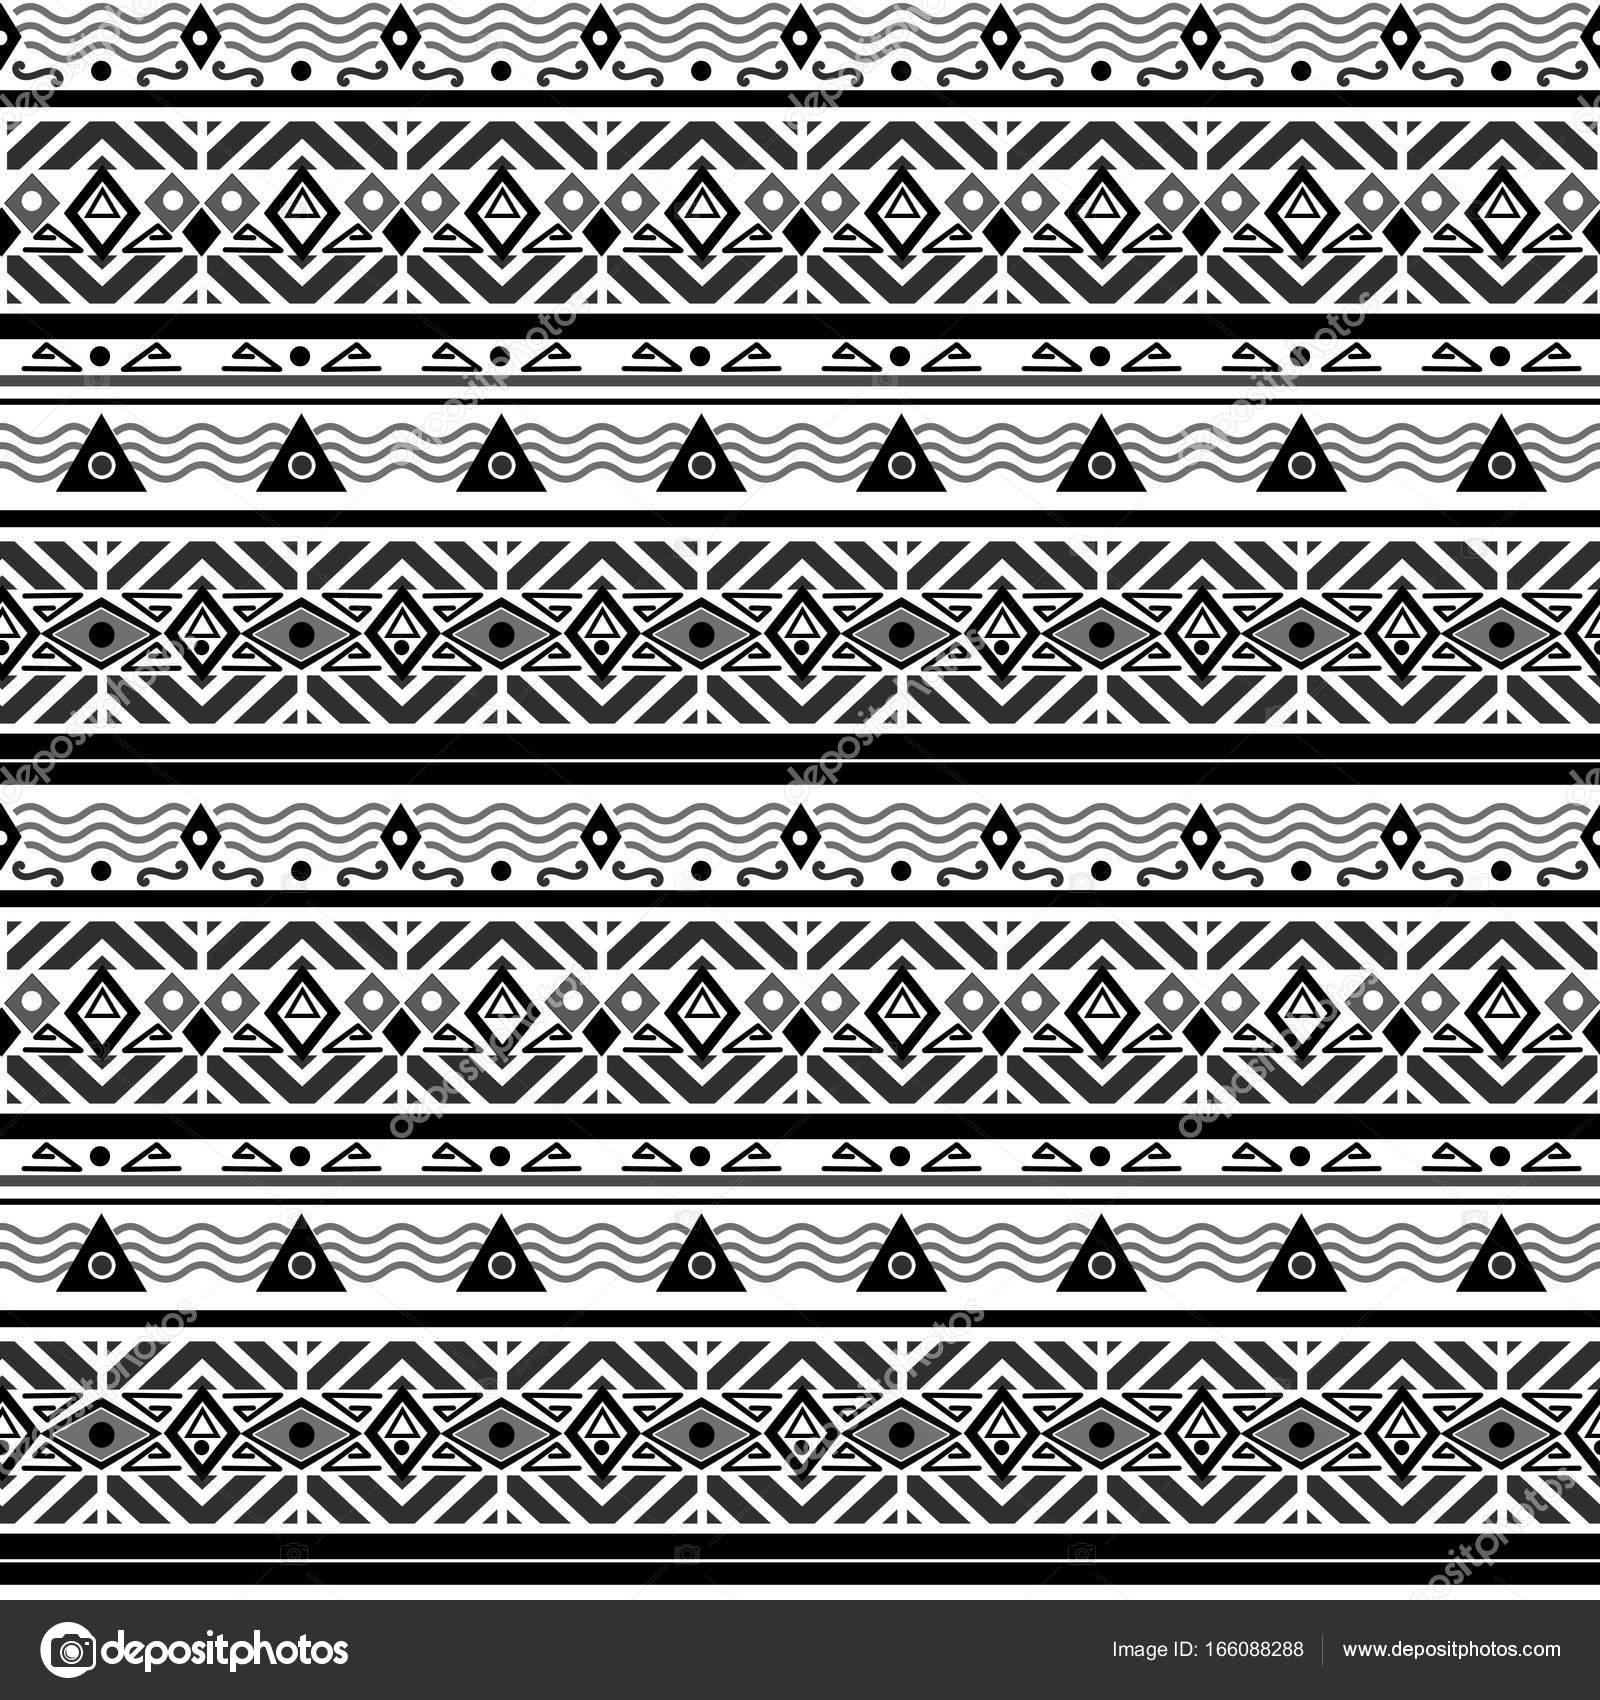 Ethno Muster nahtlose monochrome folk ethno-muster — stockfoto © fuzzyfoxer